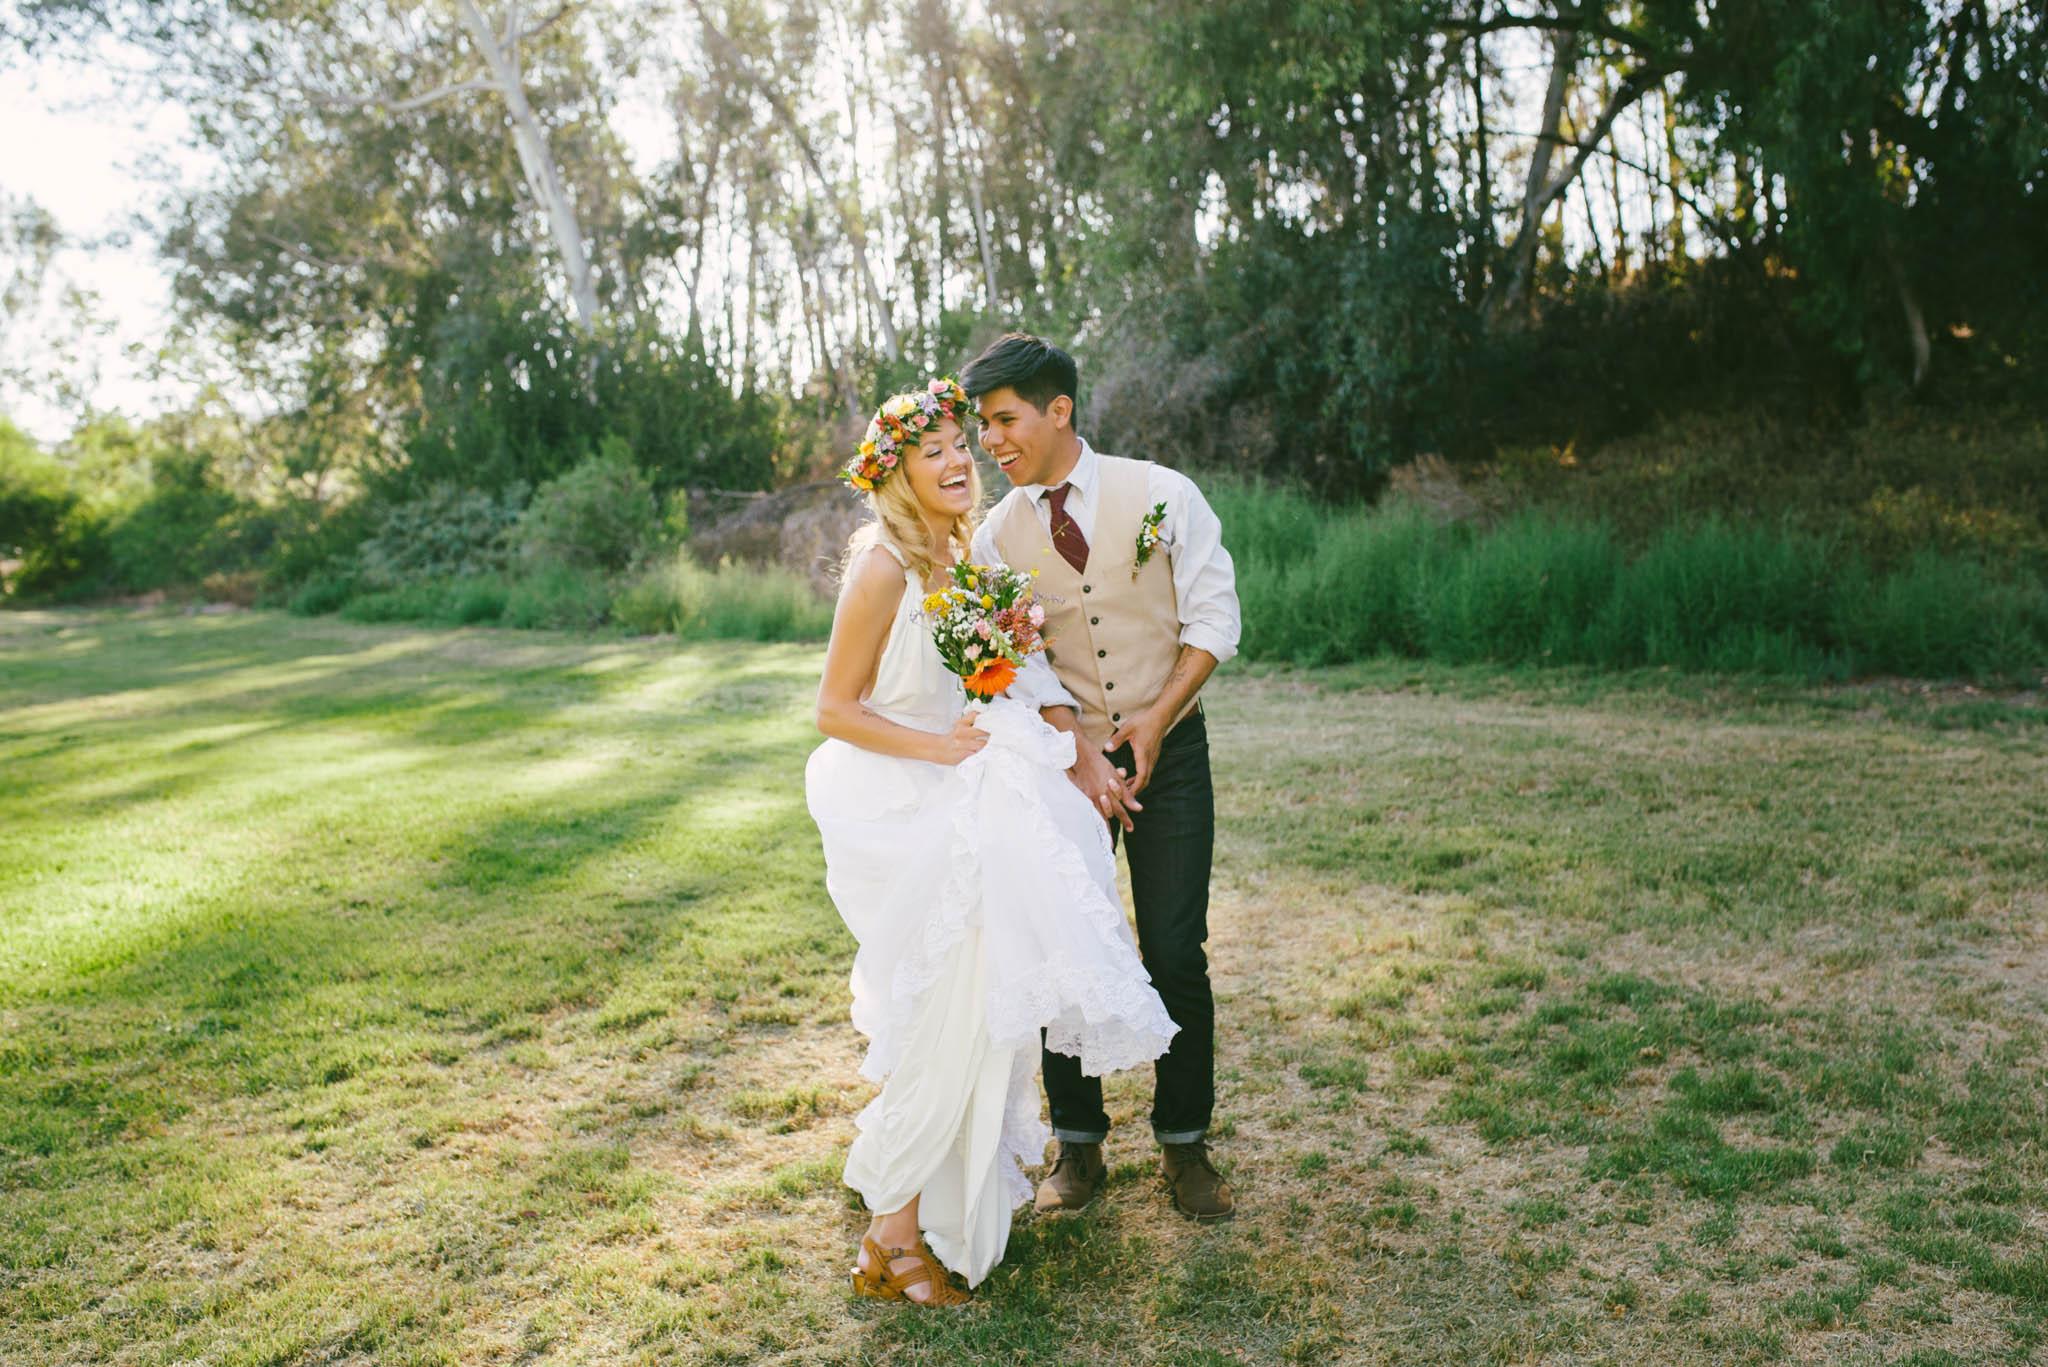 ©Isaiah & Taylor Photography - Los Angeles Wedding Photographer - Mexican Bohemian Wedding, Laguna Niguel Regional Park, Orange County-36.jpg